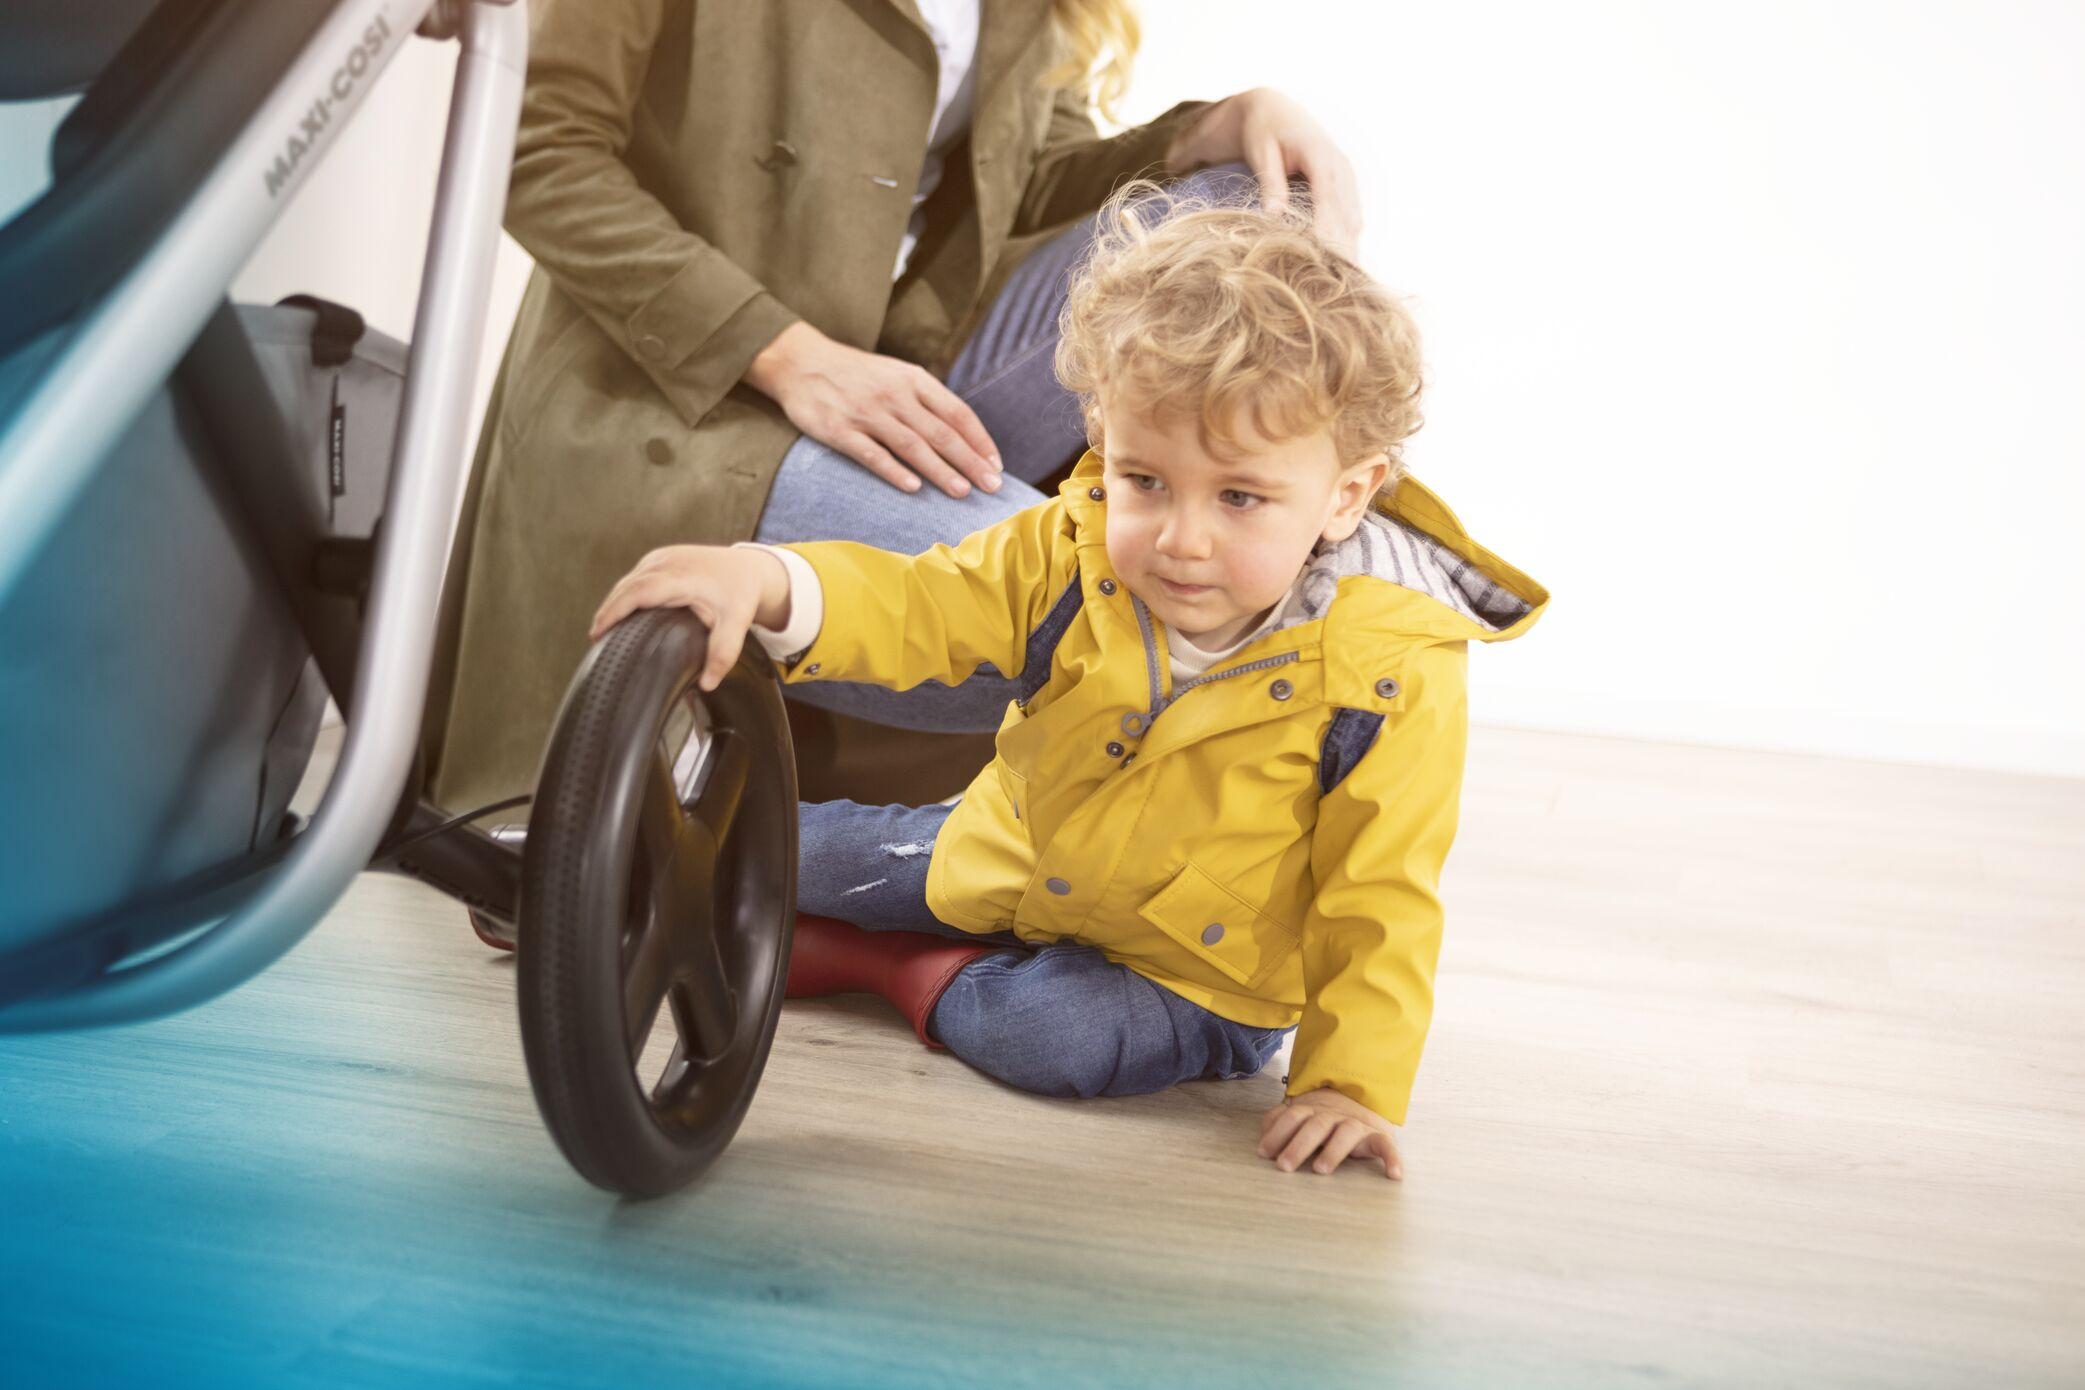 MC1311_2018_Maxicosi_stroller_Lila_Lifestyle_Indoor_toddlerplayingwithsmoothridewheels_Landscape_RGB